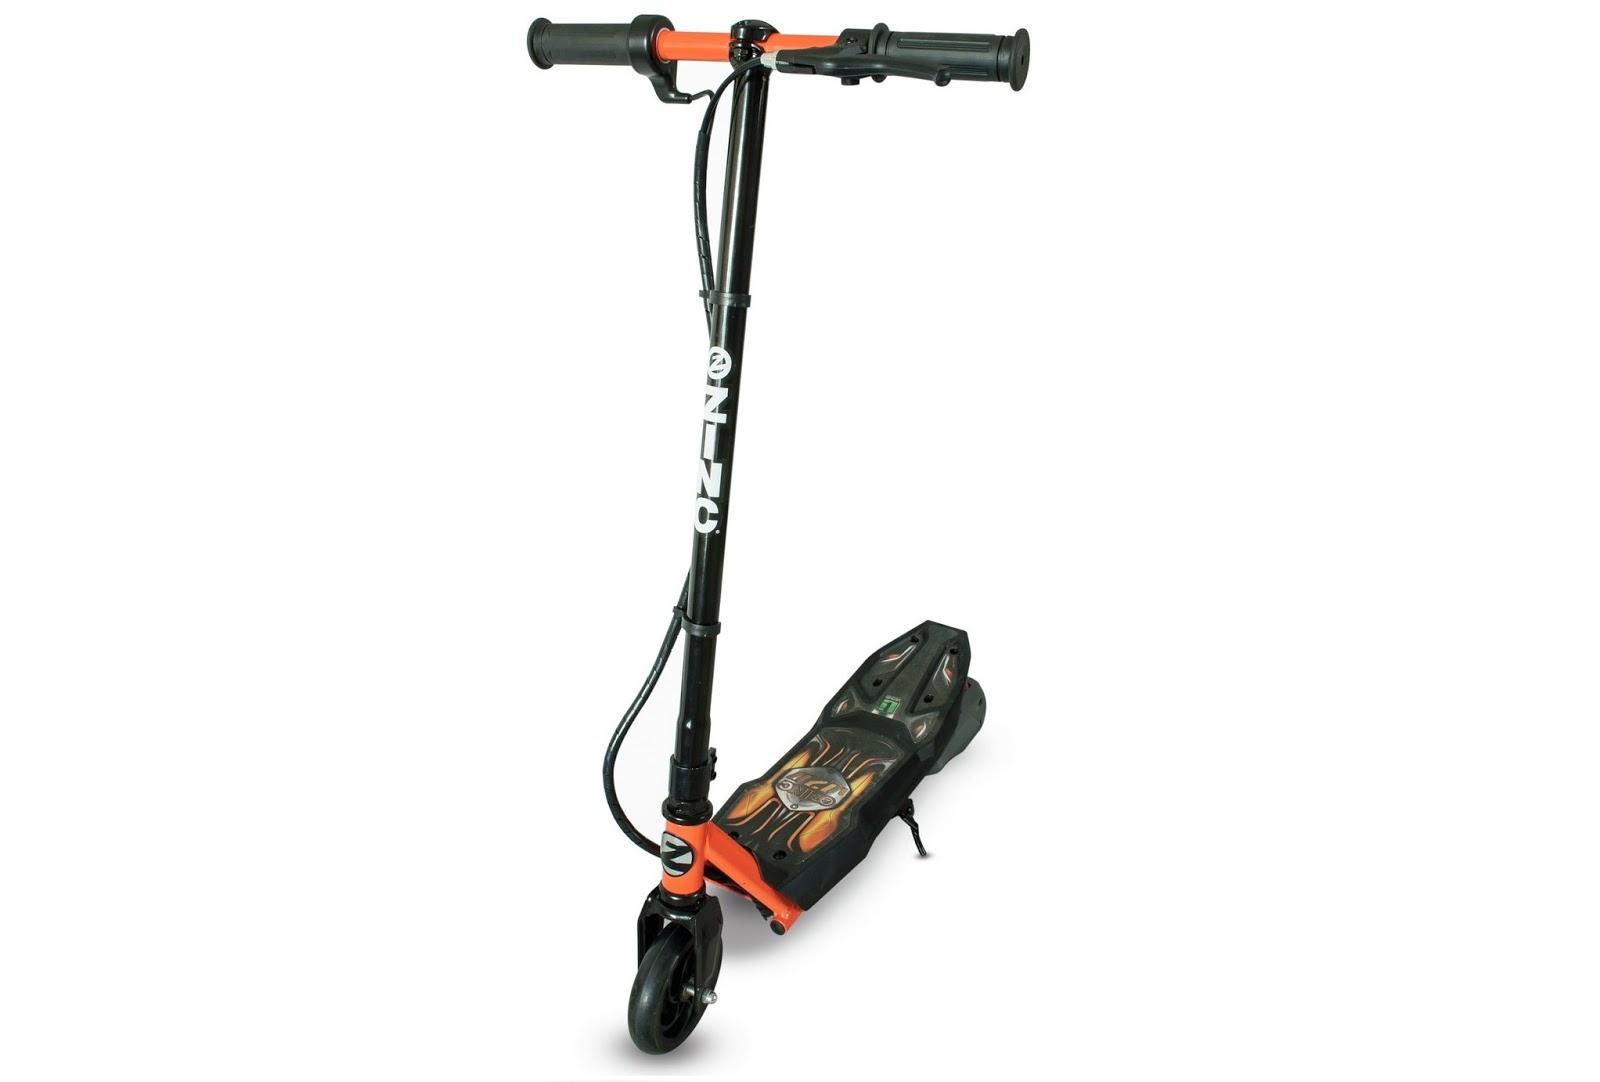 Review Zinc Lithium Volt 120 Electric Scooter The Test Pit